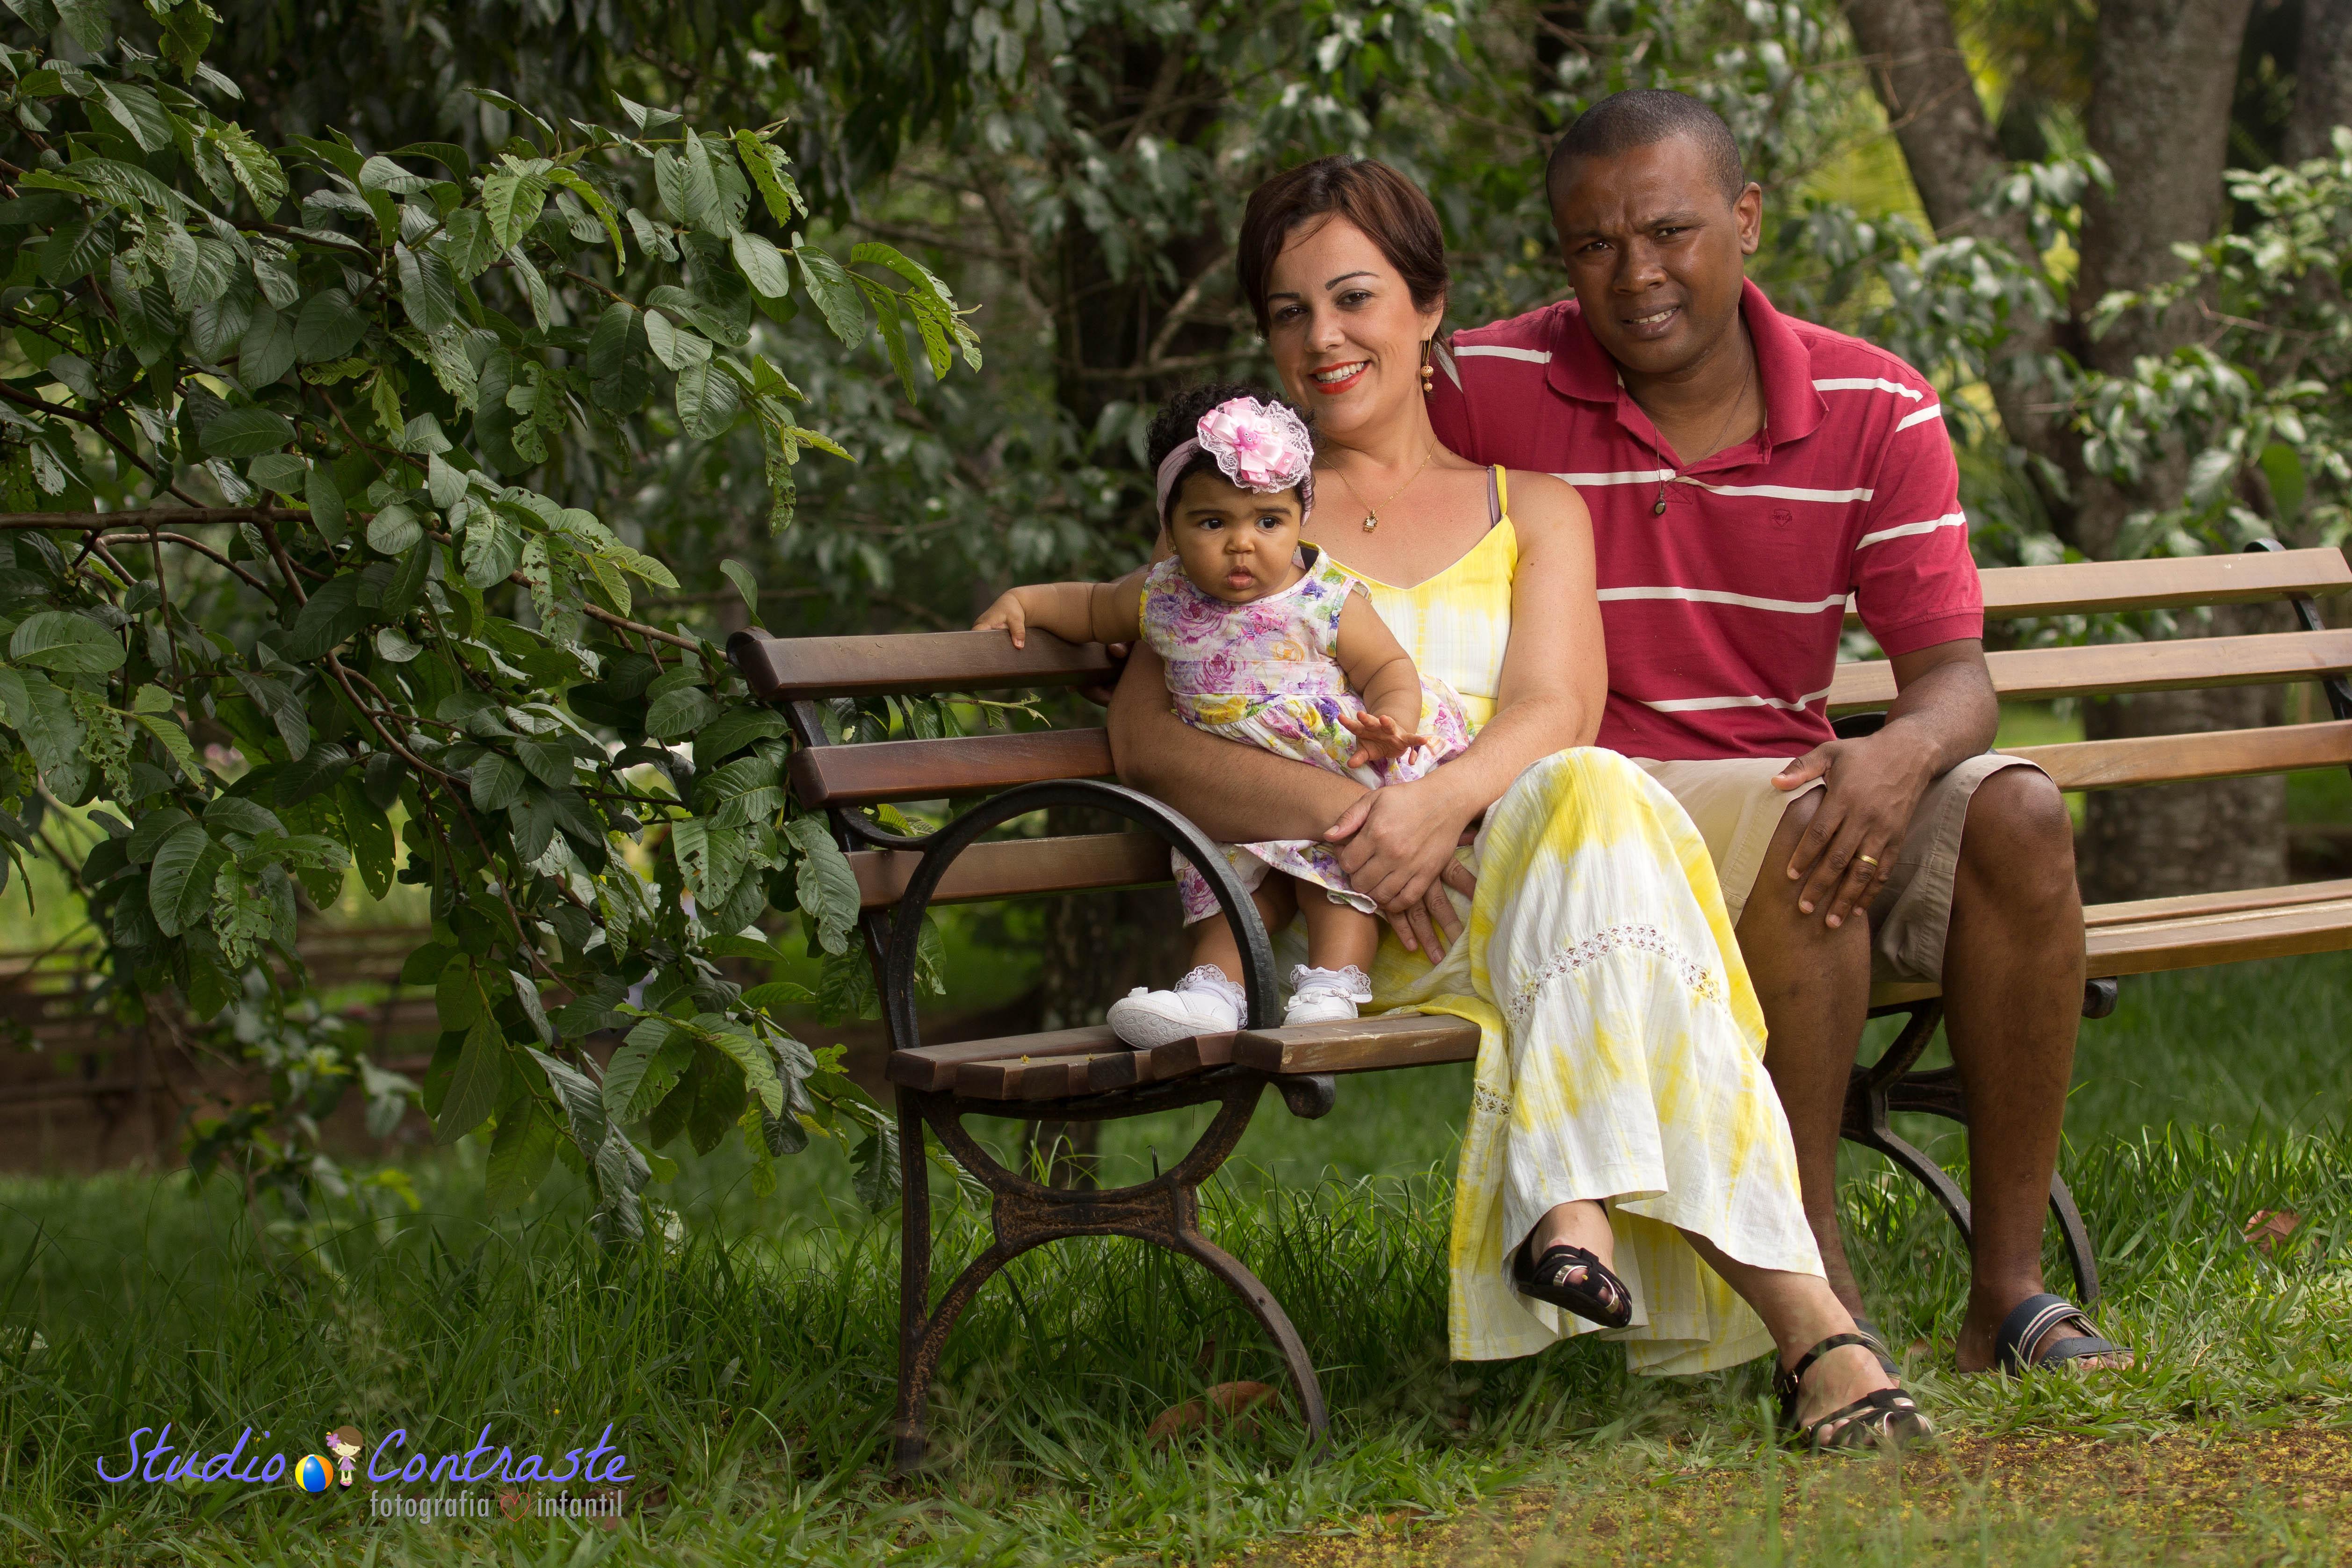 Julia & Família